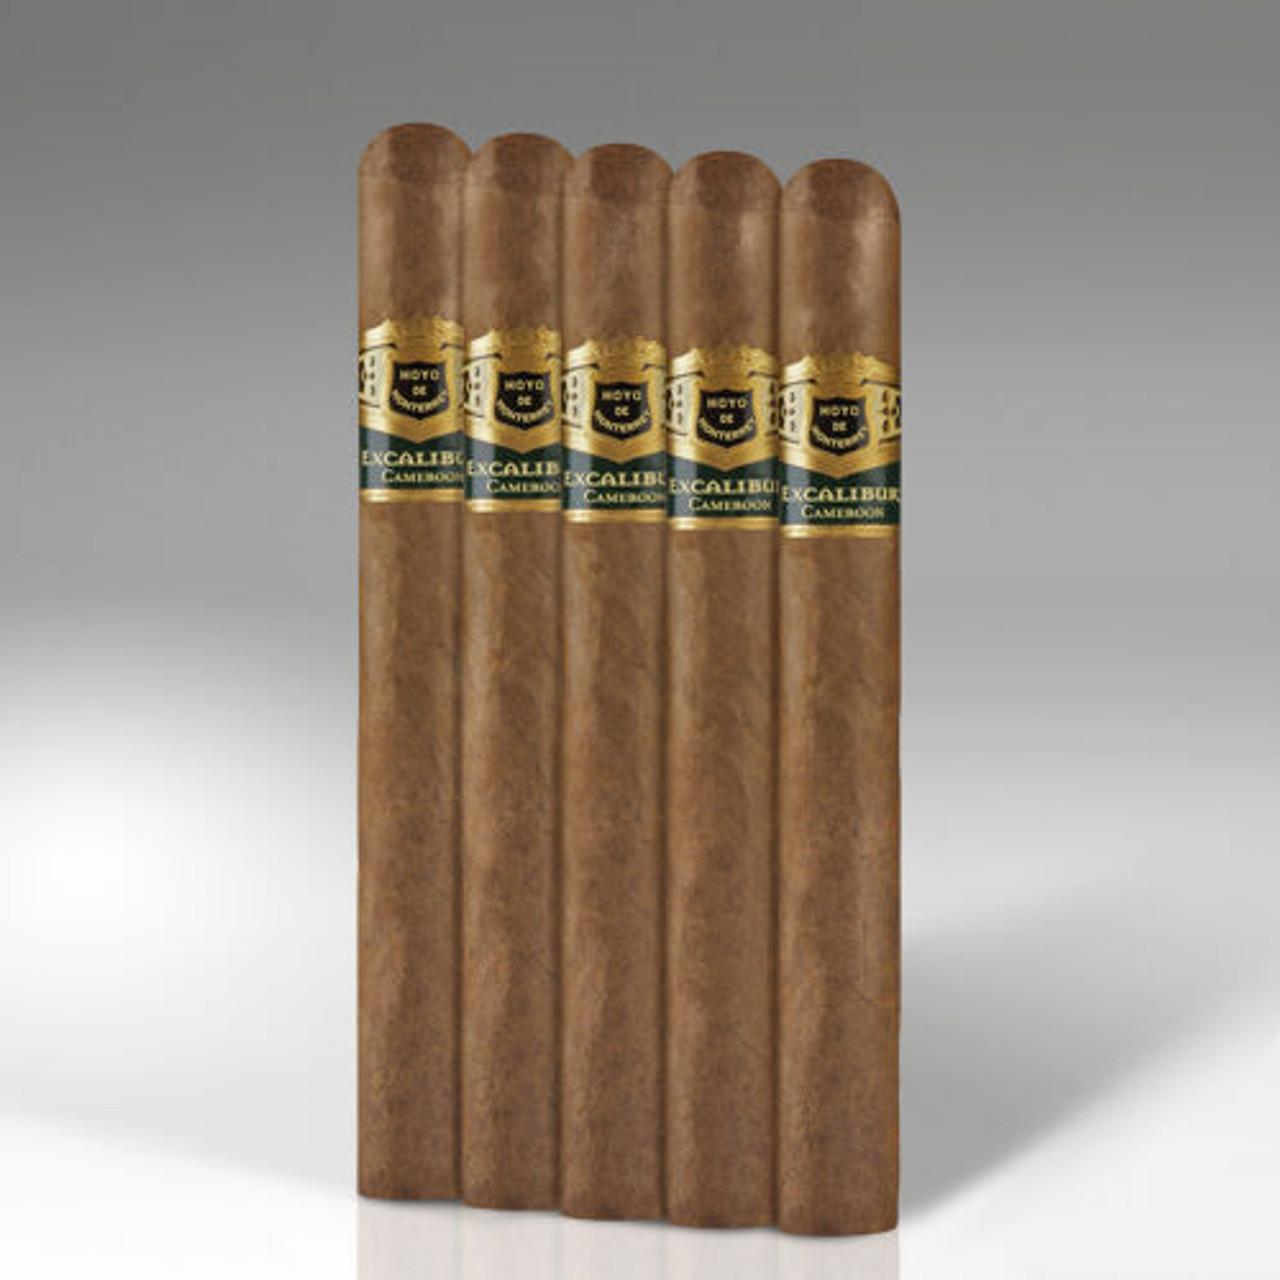 Excalibur Cameroon Lancelot Cigars - 7.25 x 54 (Pack of 5)